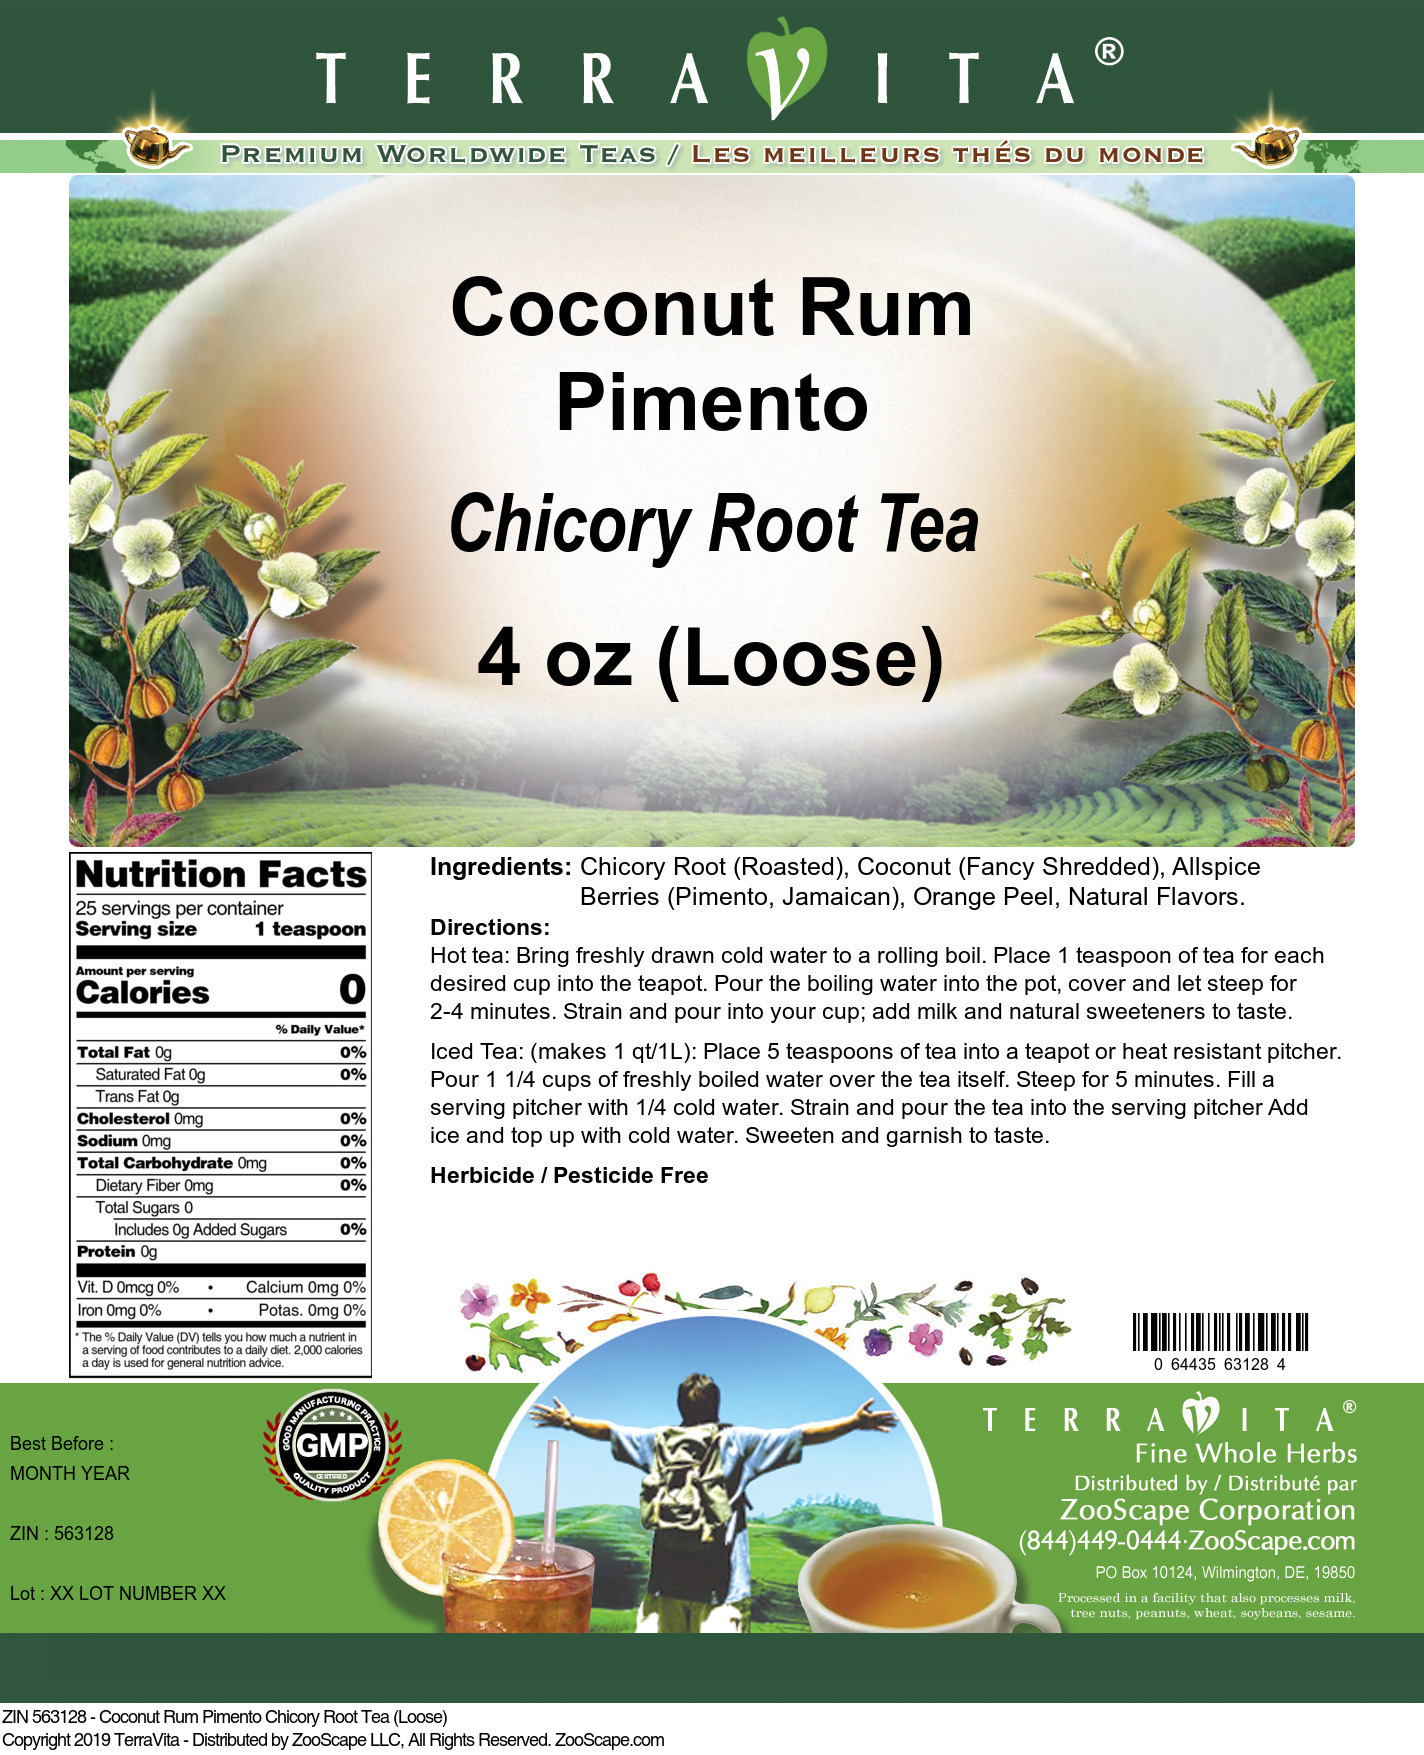 Coconut Rum Pimento Chicory Root Tea (Loose)